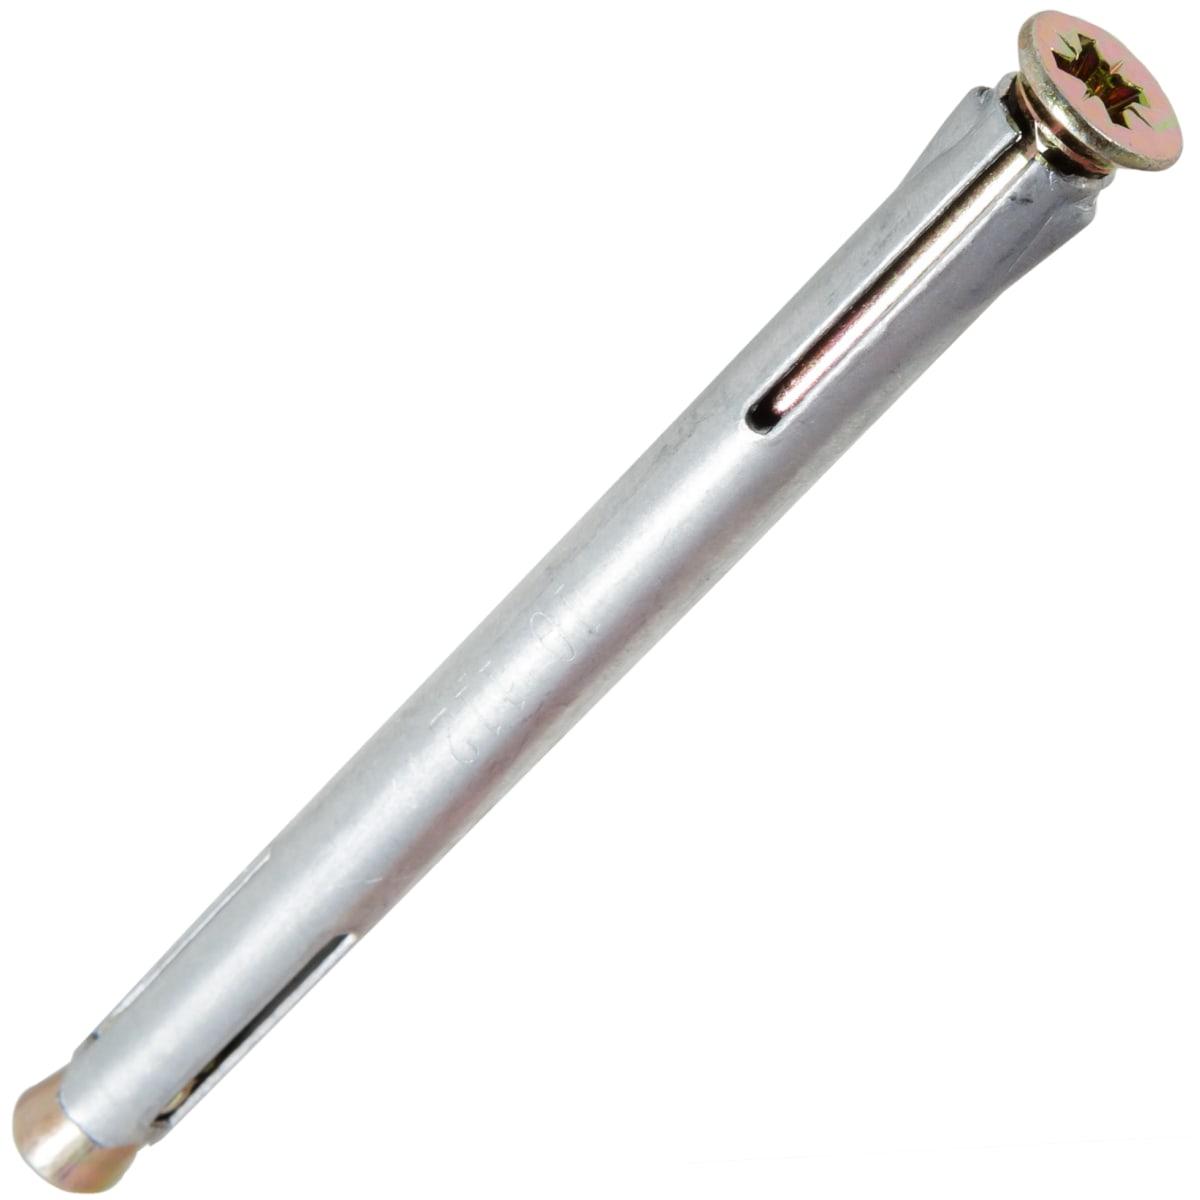 Дюбель рамный 10x112 мм, сталь, 10 шт.